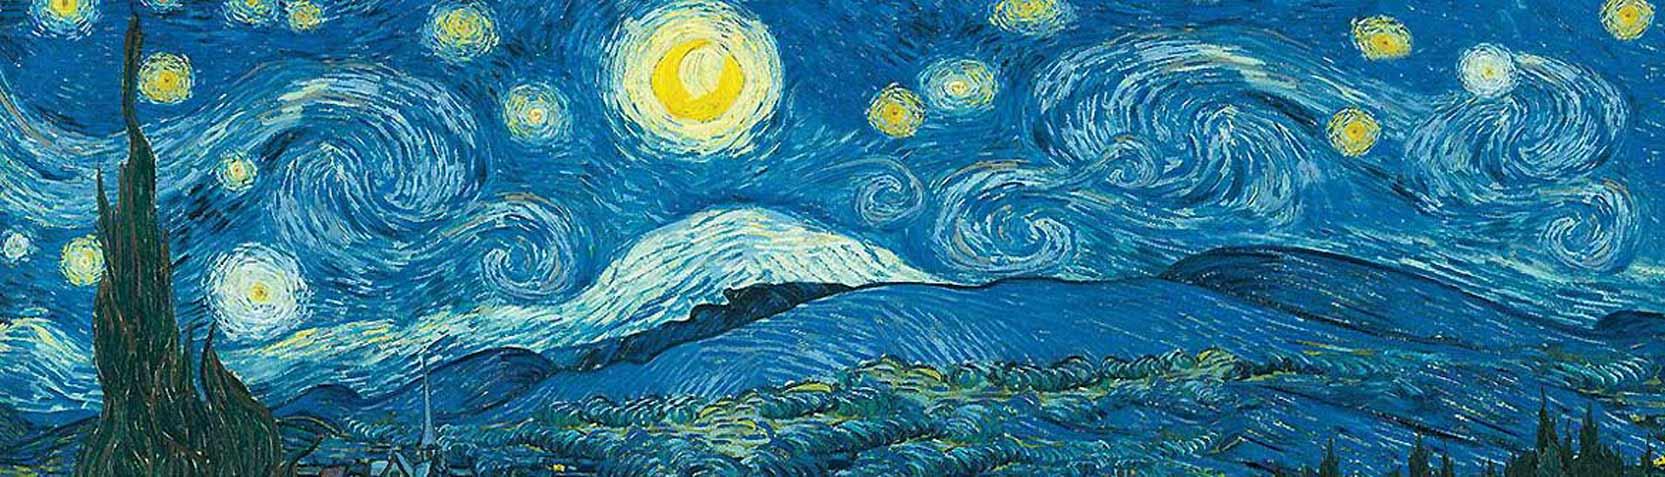 Künstler - Vincent van Gogh